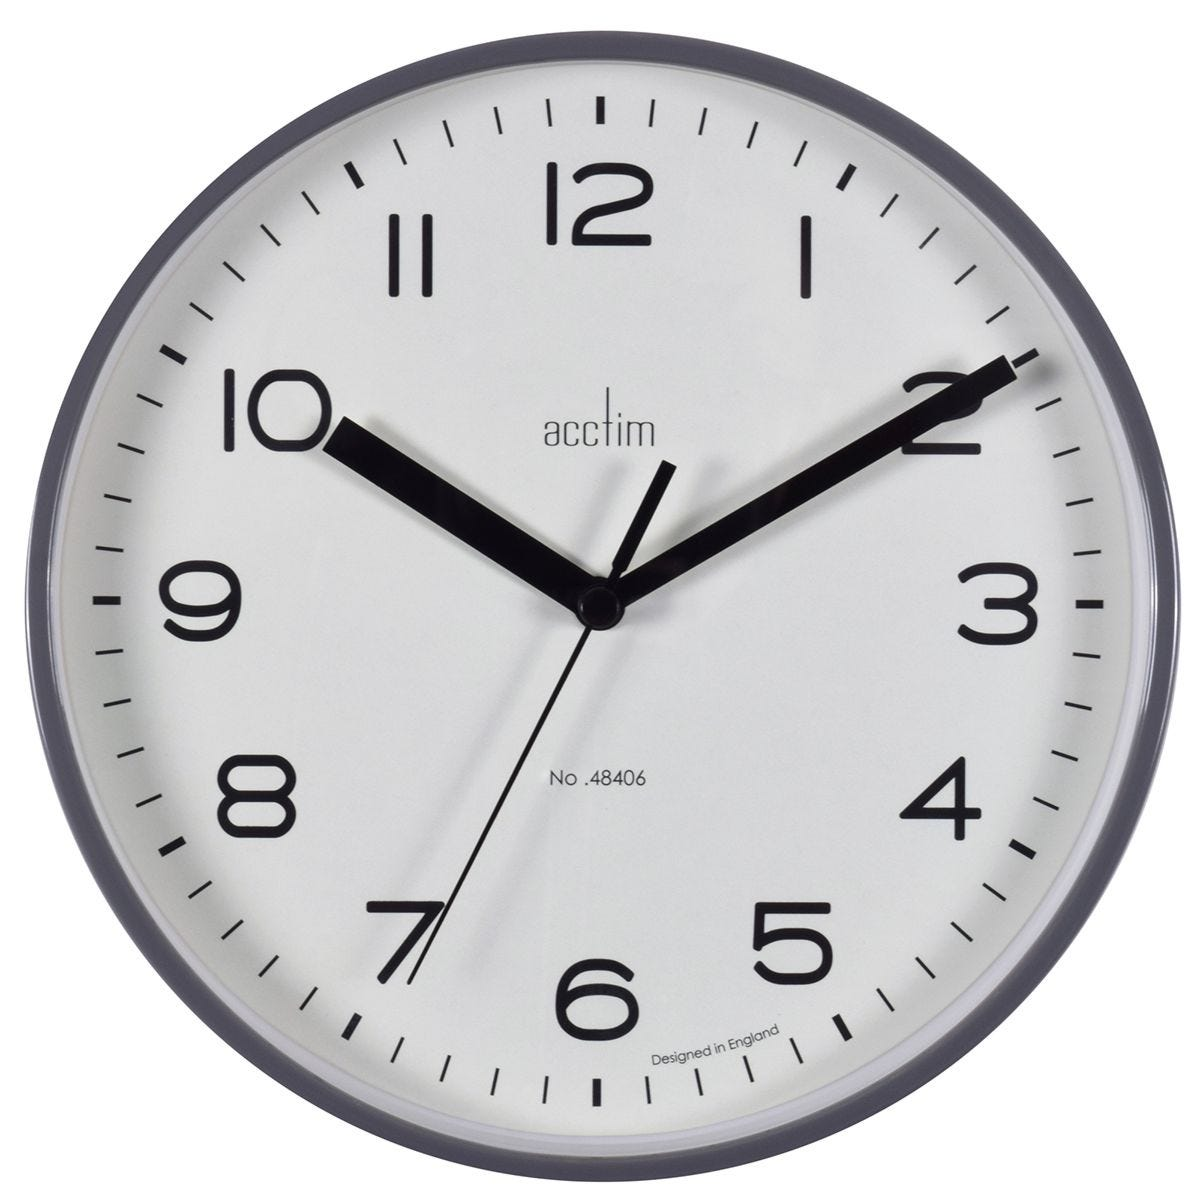 Acctim 'Runwell' Wall Clock - Smoke Grey